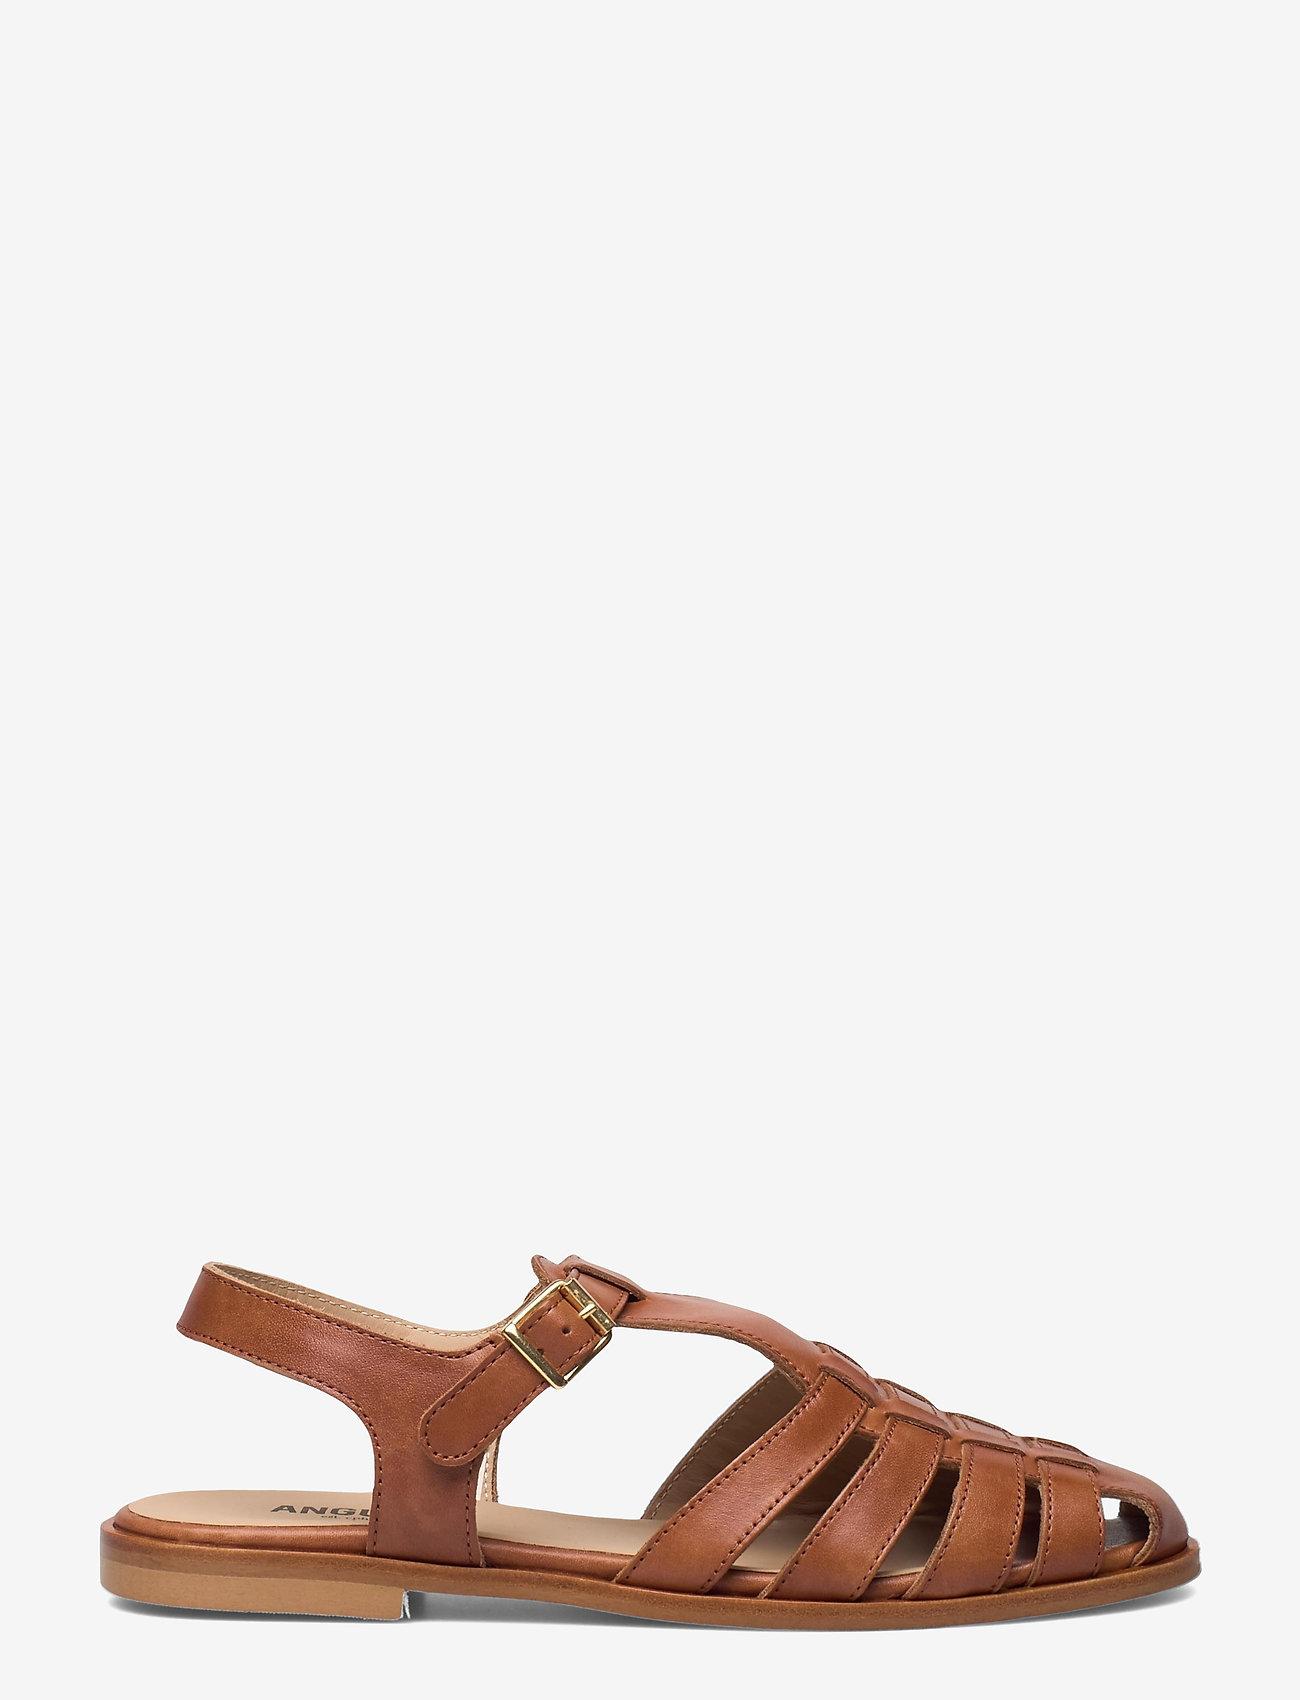 ANGULUS - Sandals - flat - closed toe - op - flache sandalen - 1789 tan - 1